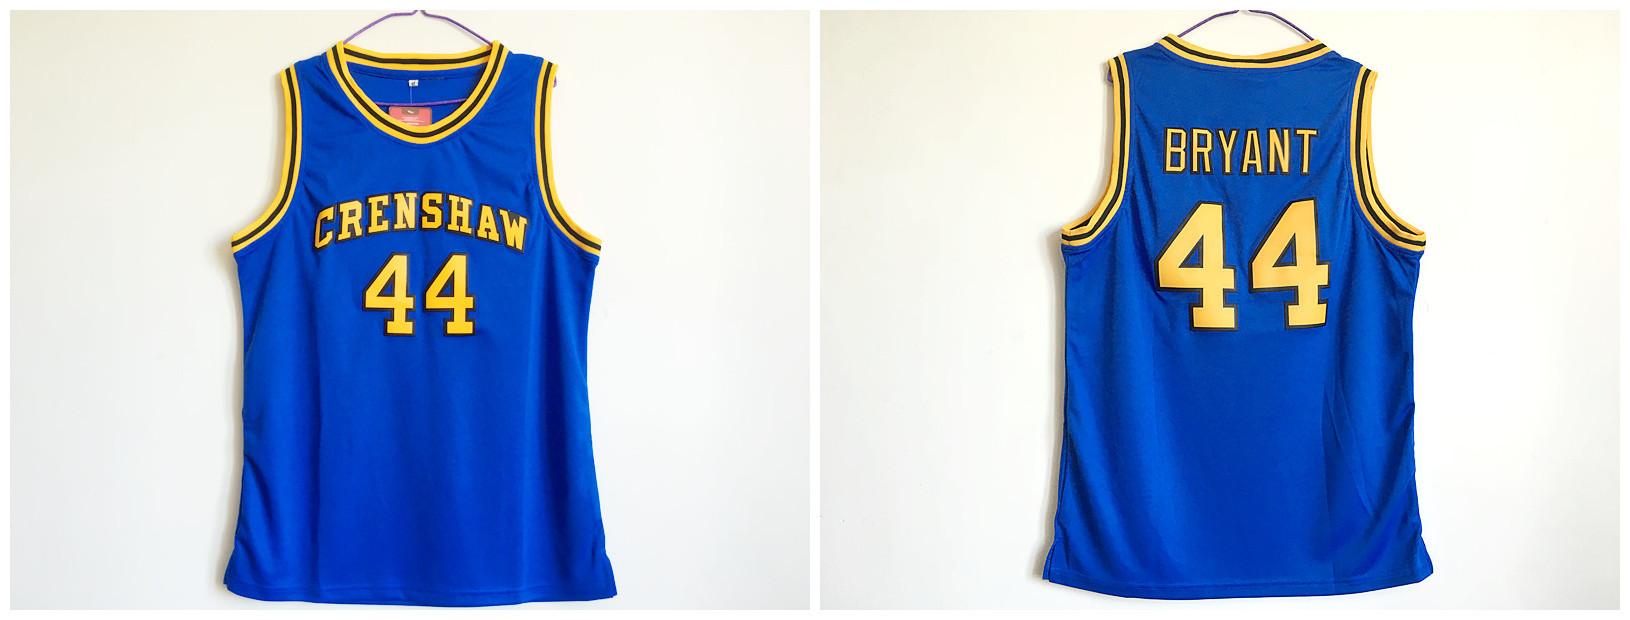 Crenshaw High School 44 Kobe Bryant Blue Basketball Jersey